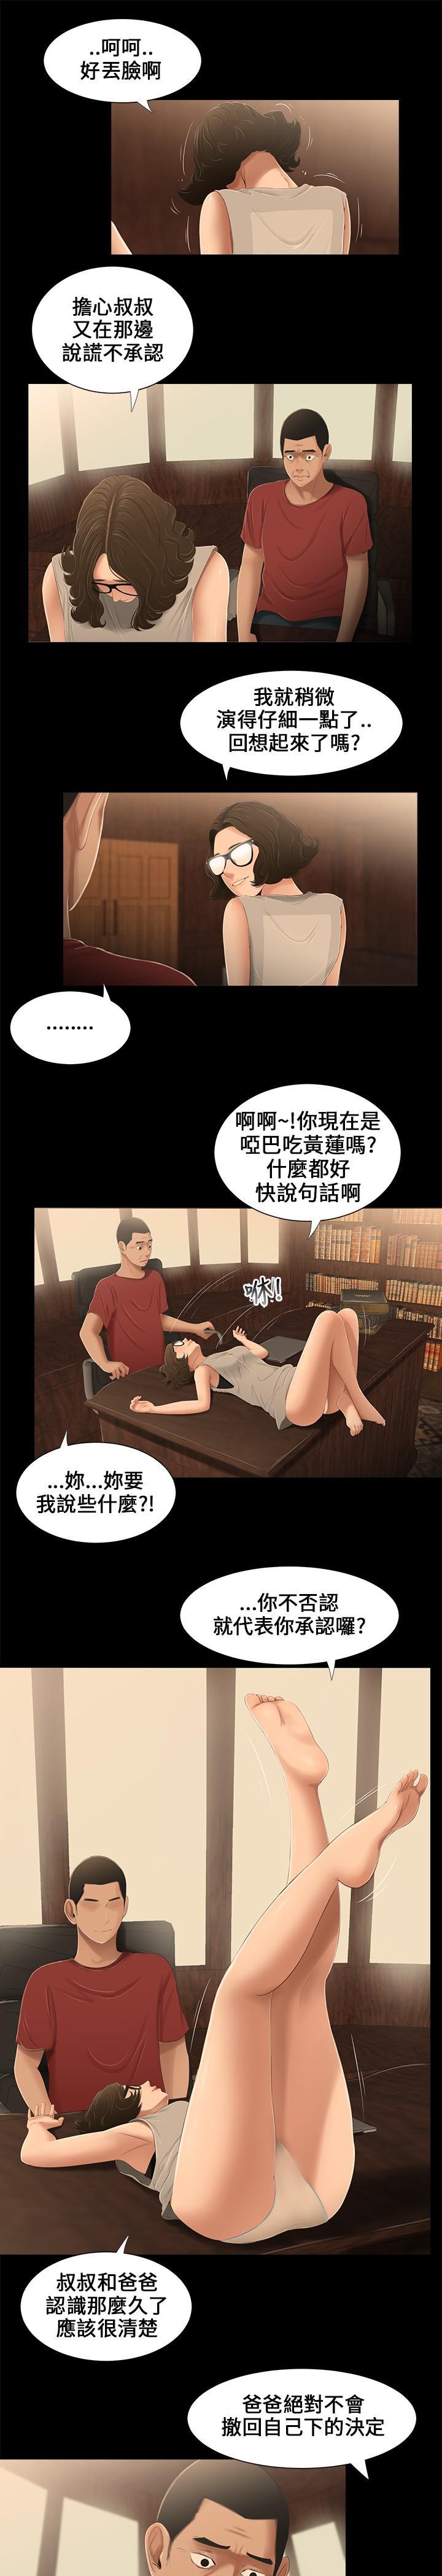 Three sisters 三姐妹Ch.13~19 (Chinese)中文 13